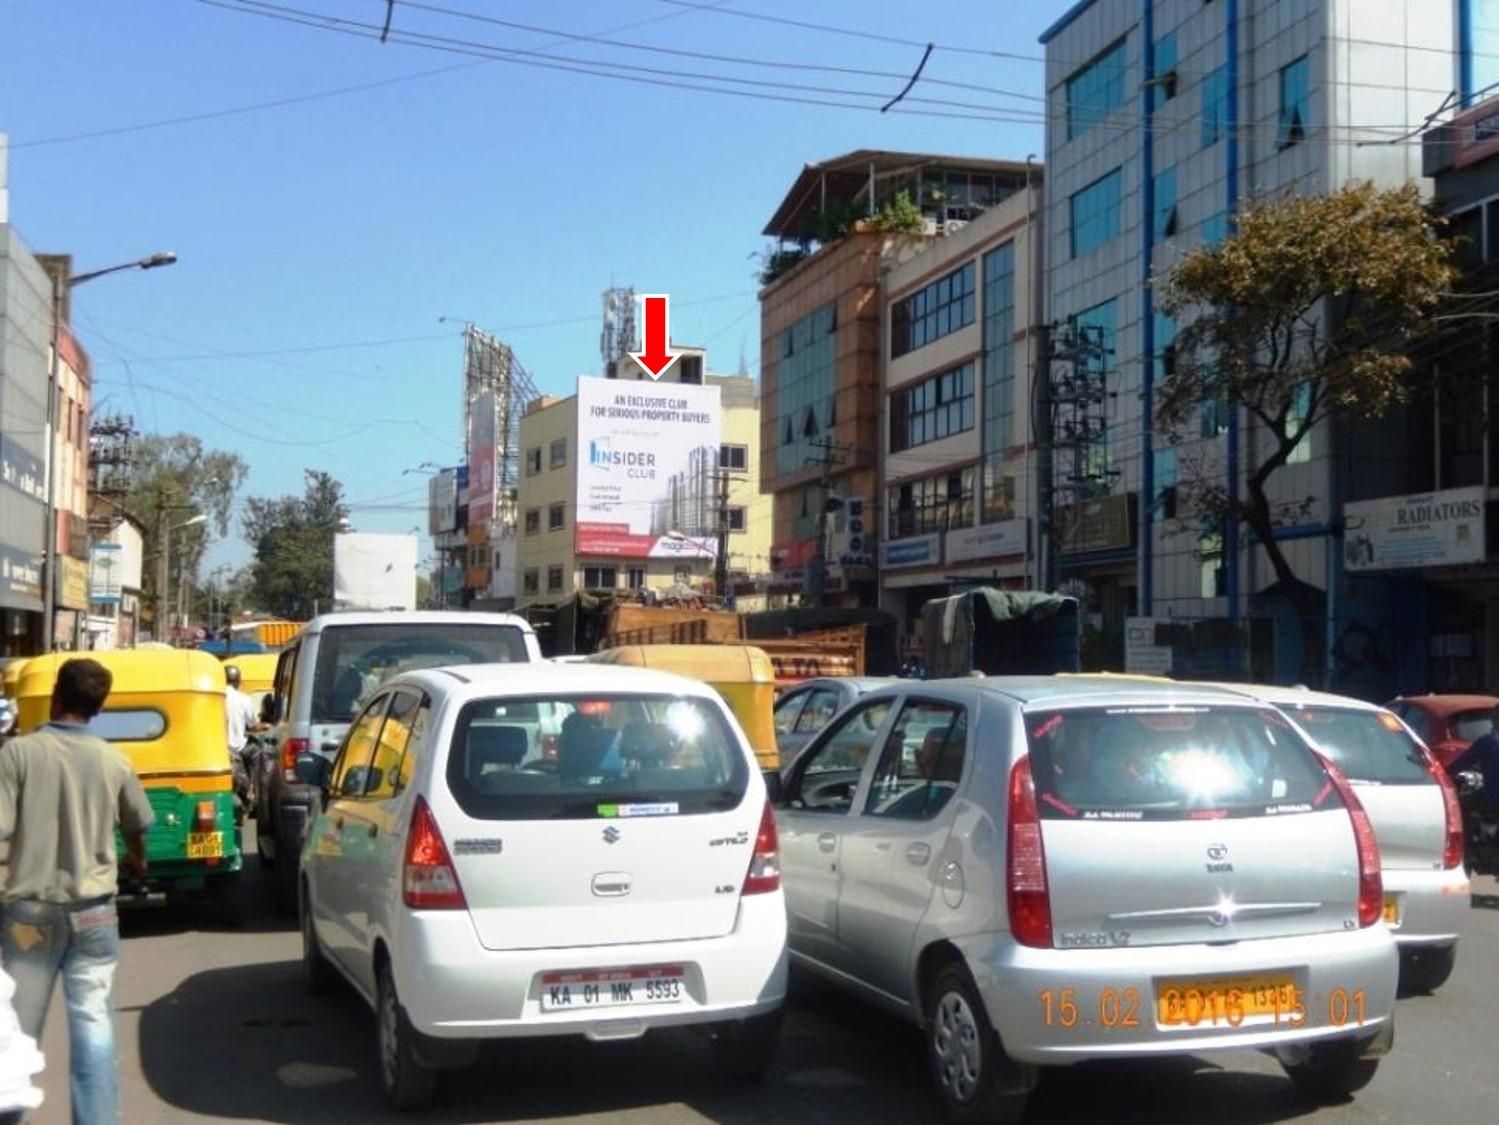 Opp Urvashi Theater Towards Lalbagh Main Gate, Bangalore